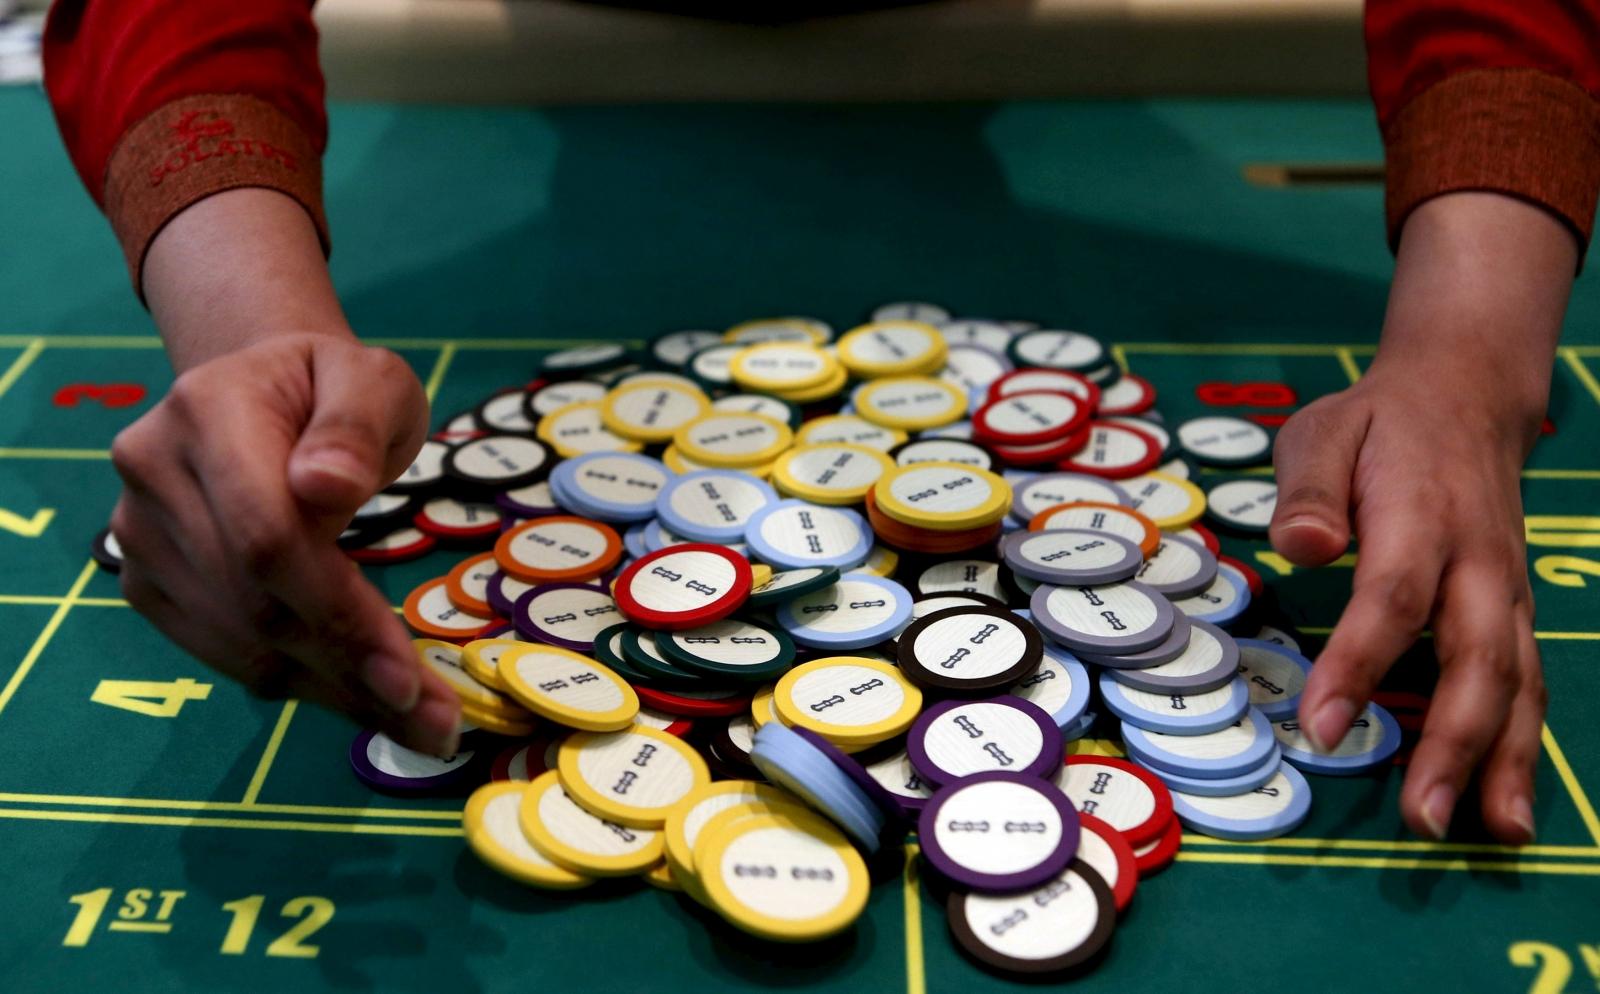 Casino billionaire online games multiplayer